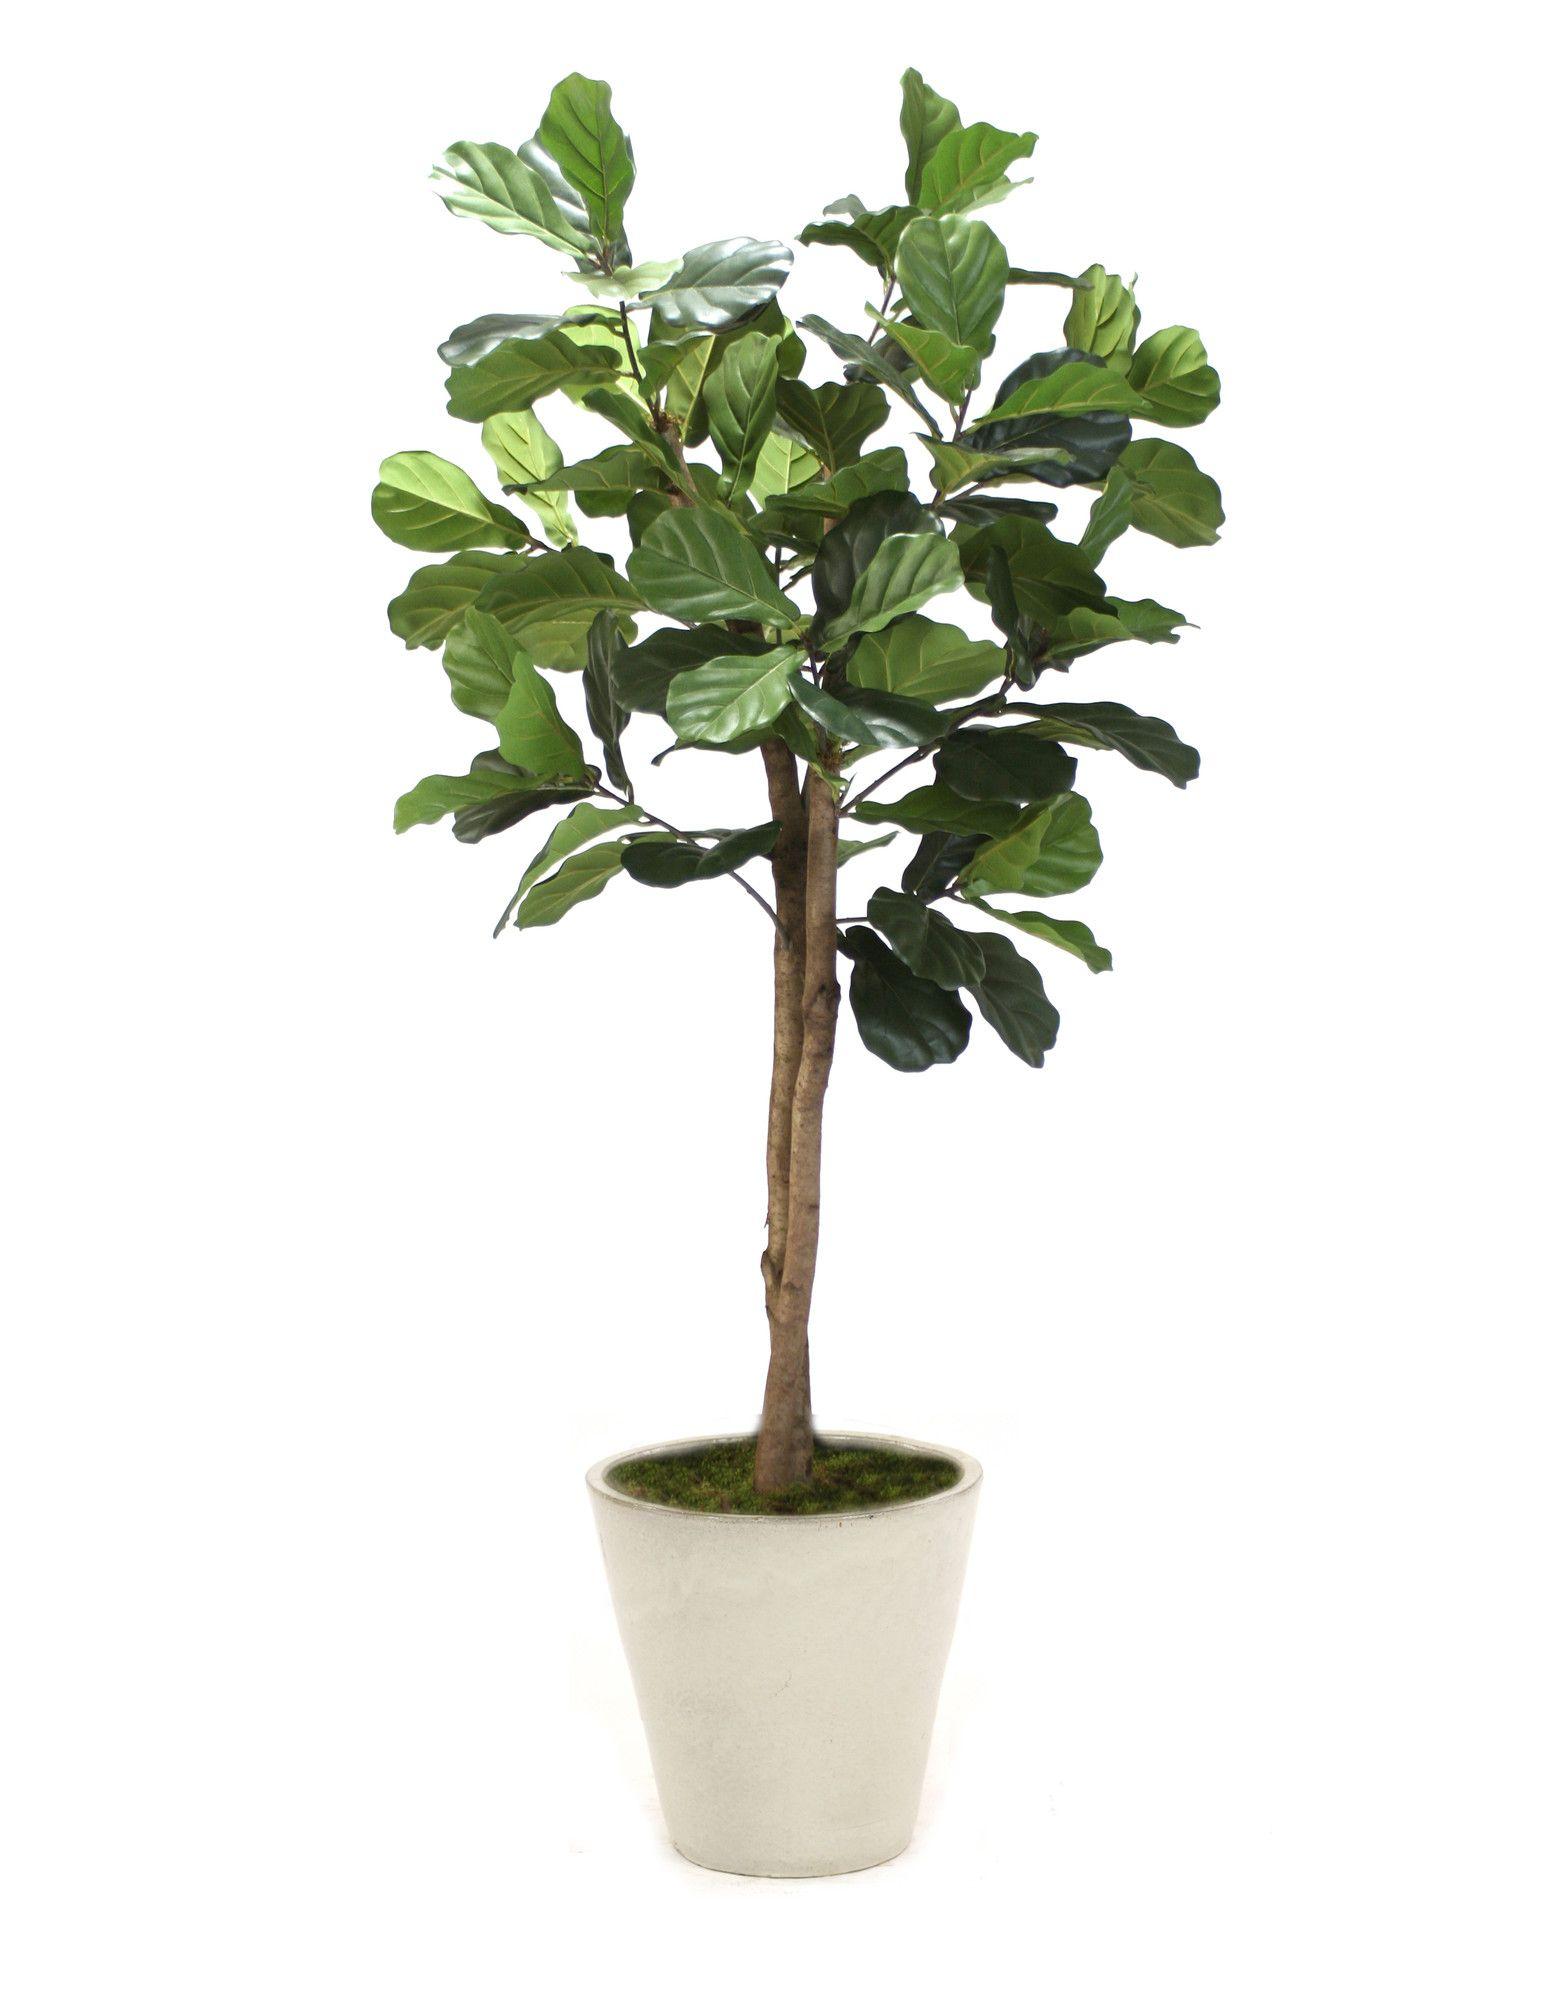 Distinctive Designs Fiddle Leaf Tree In Planter Amp Reviews